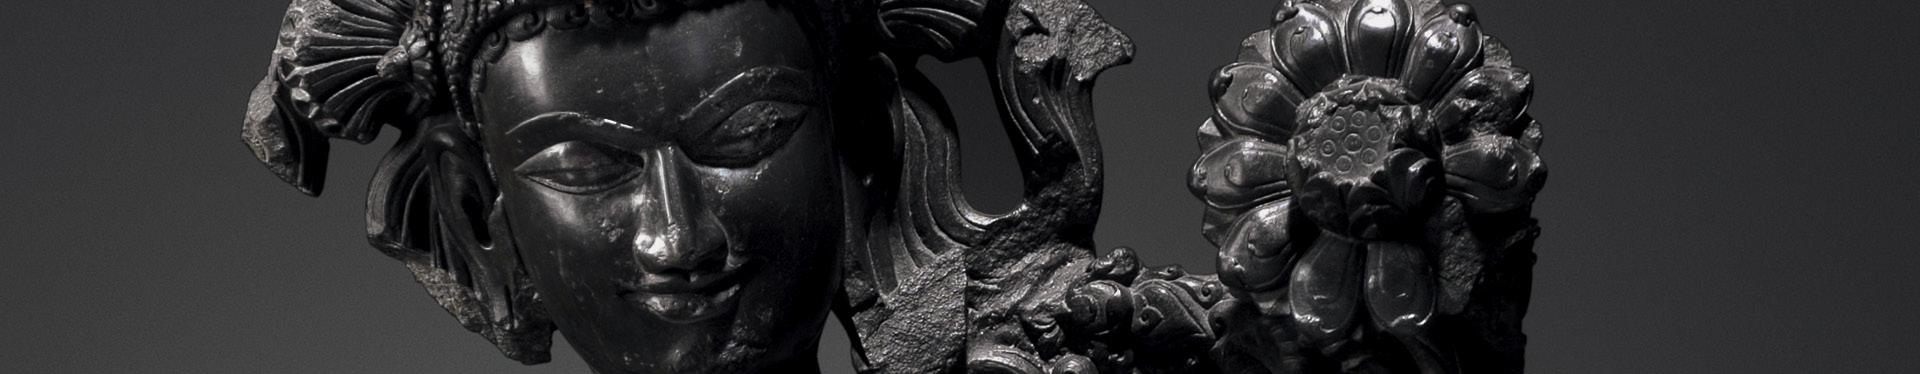 Indian-Himalayan-Southeast-Asian-Art-banner-v3_30_1_20170404155604.jpg